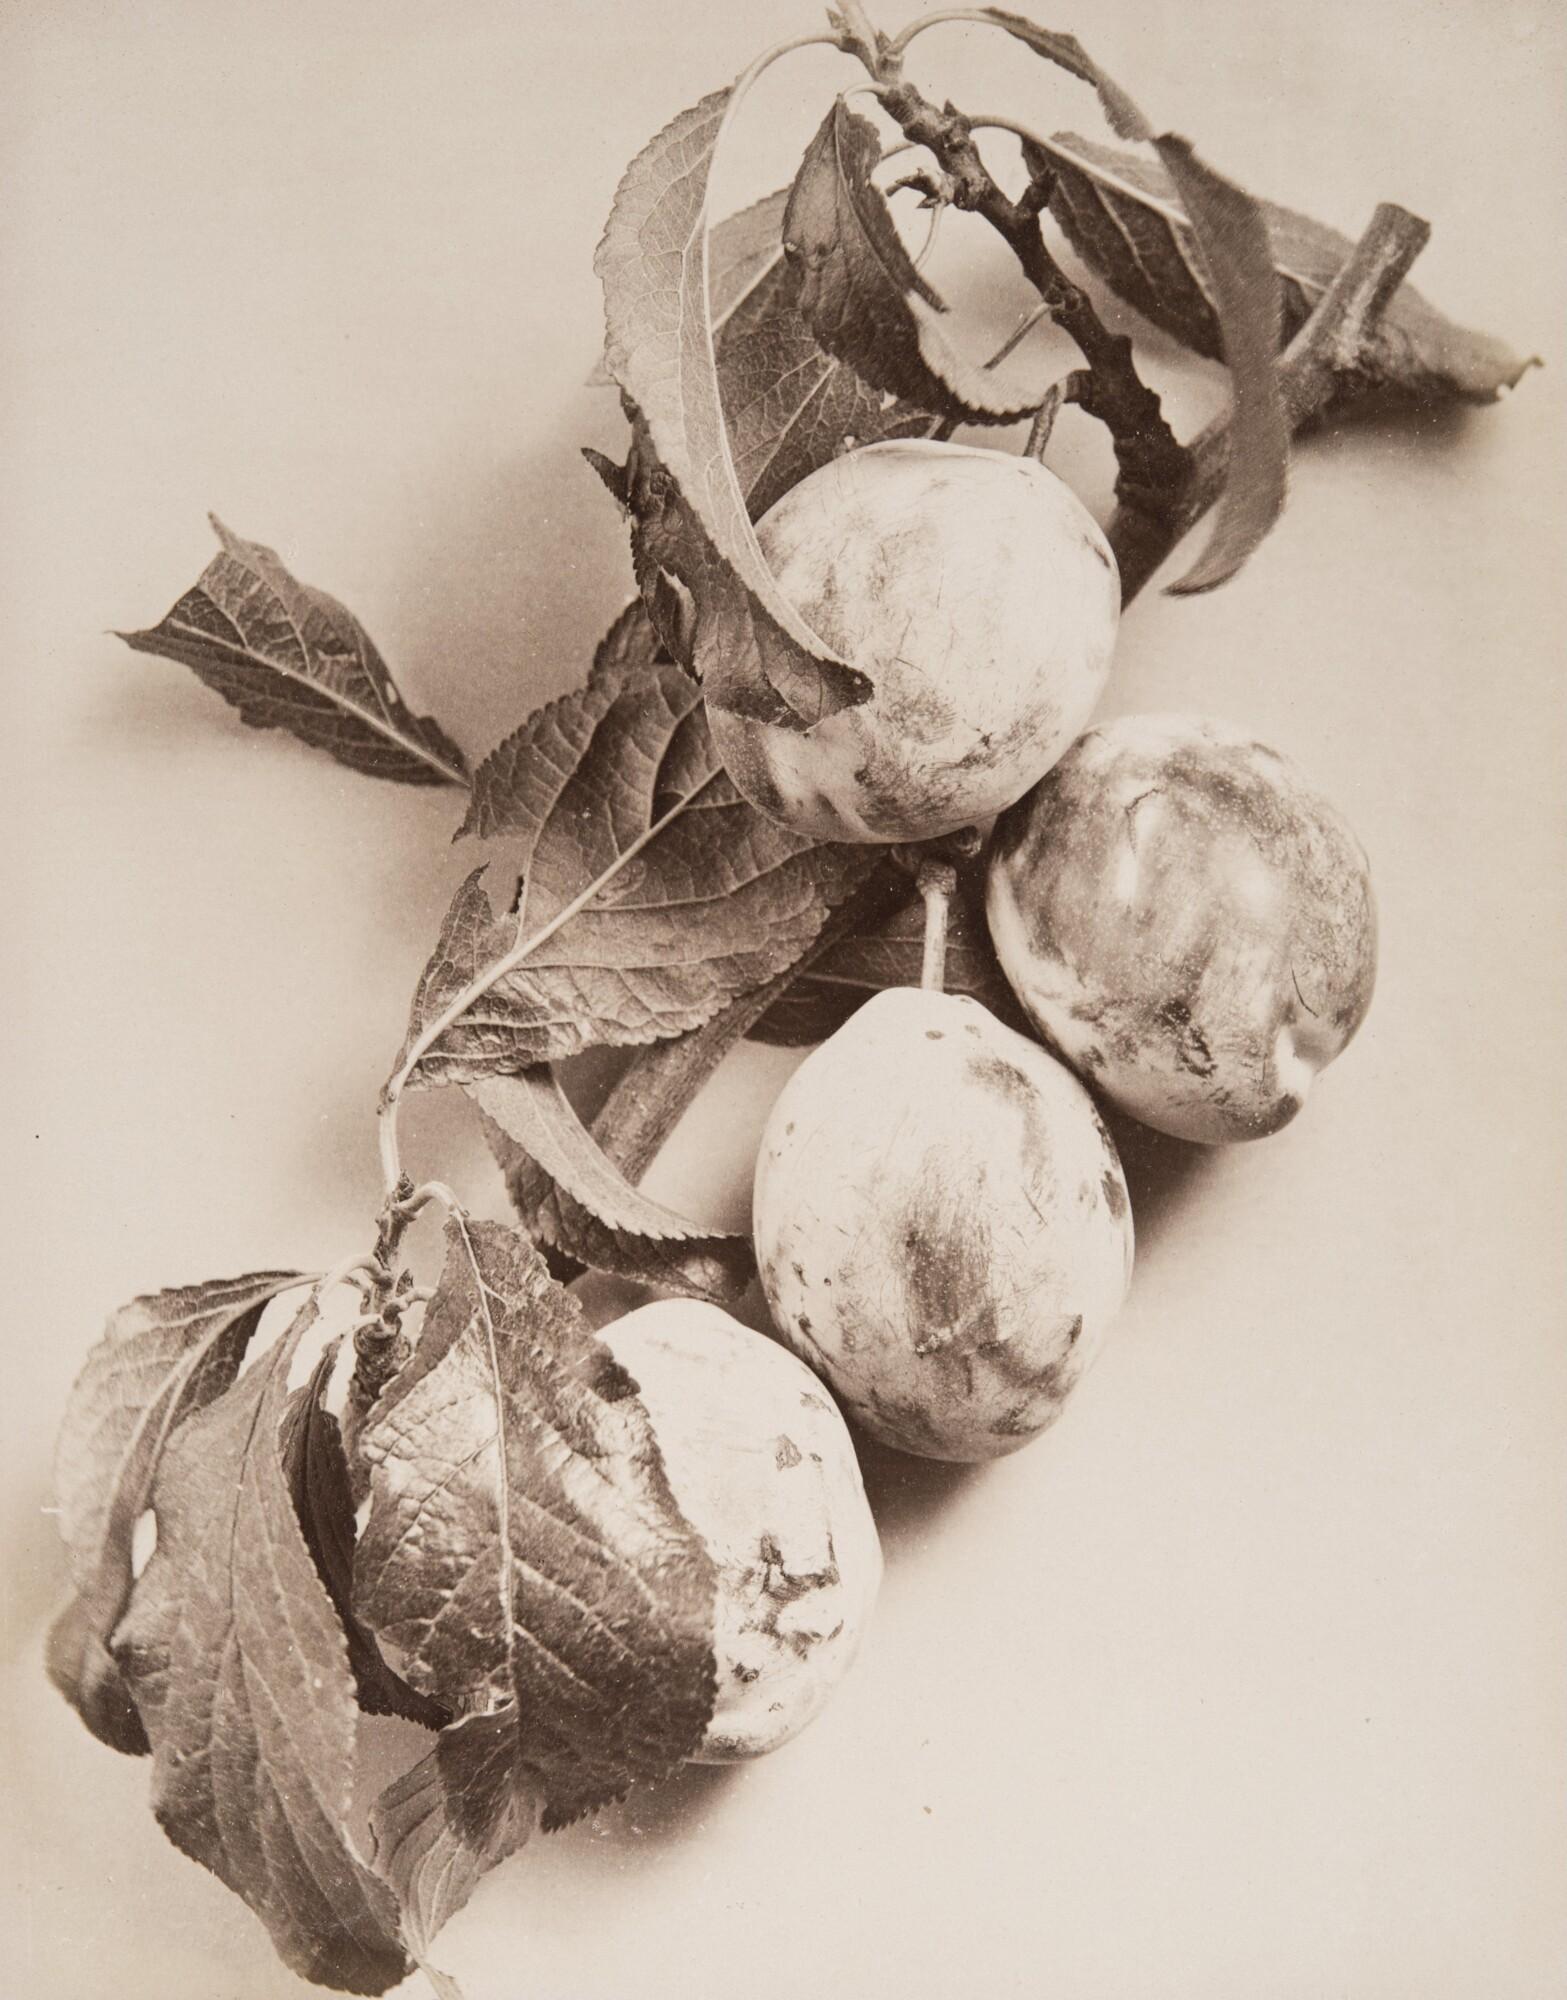 Алинари.    Слива,1860‑е   Альбуминовый отпечаток